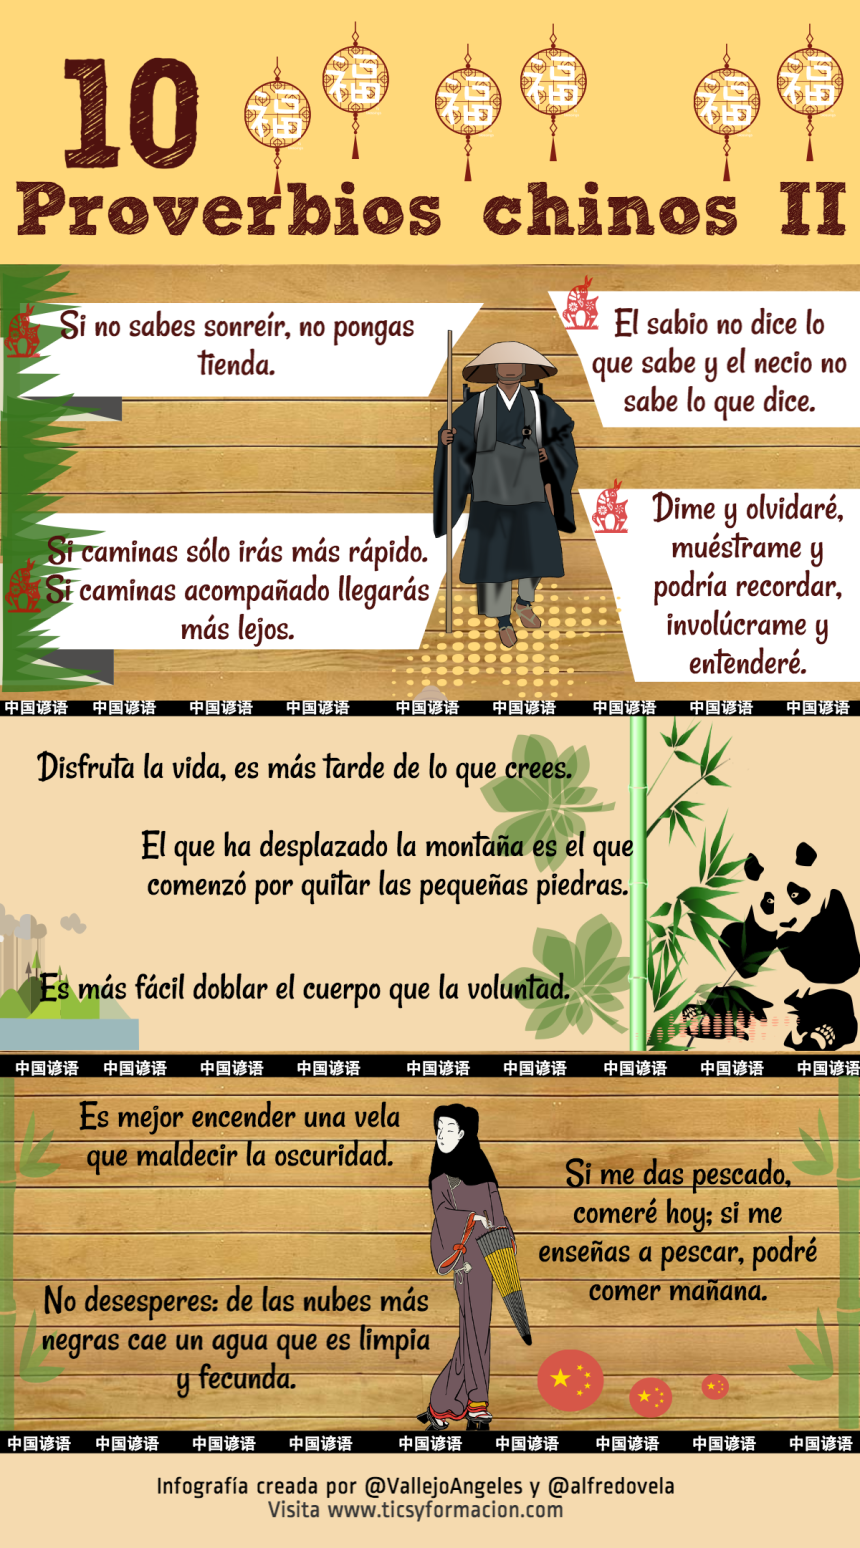 10 proverbios chinos (II)